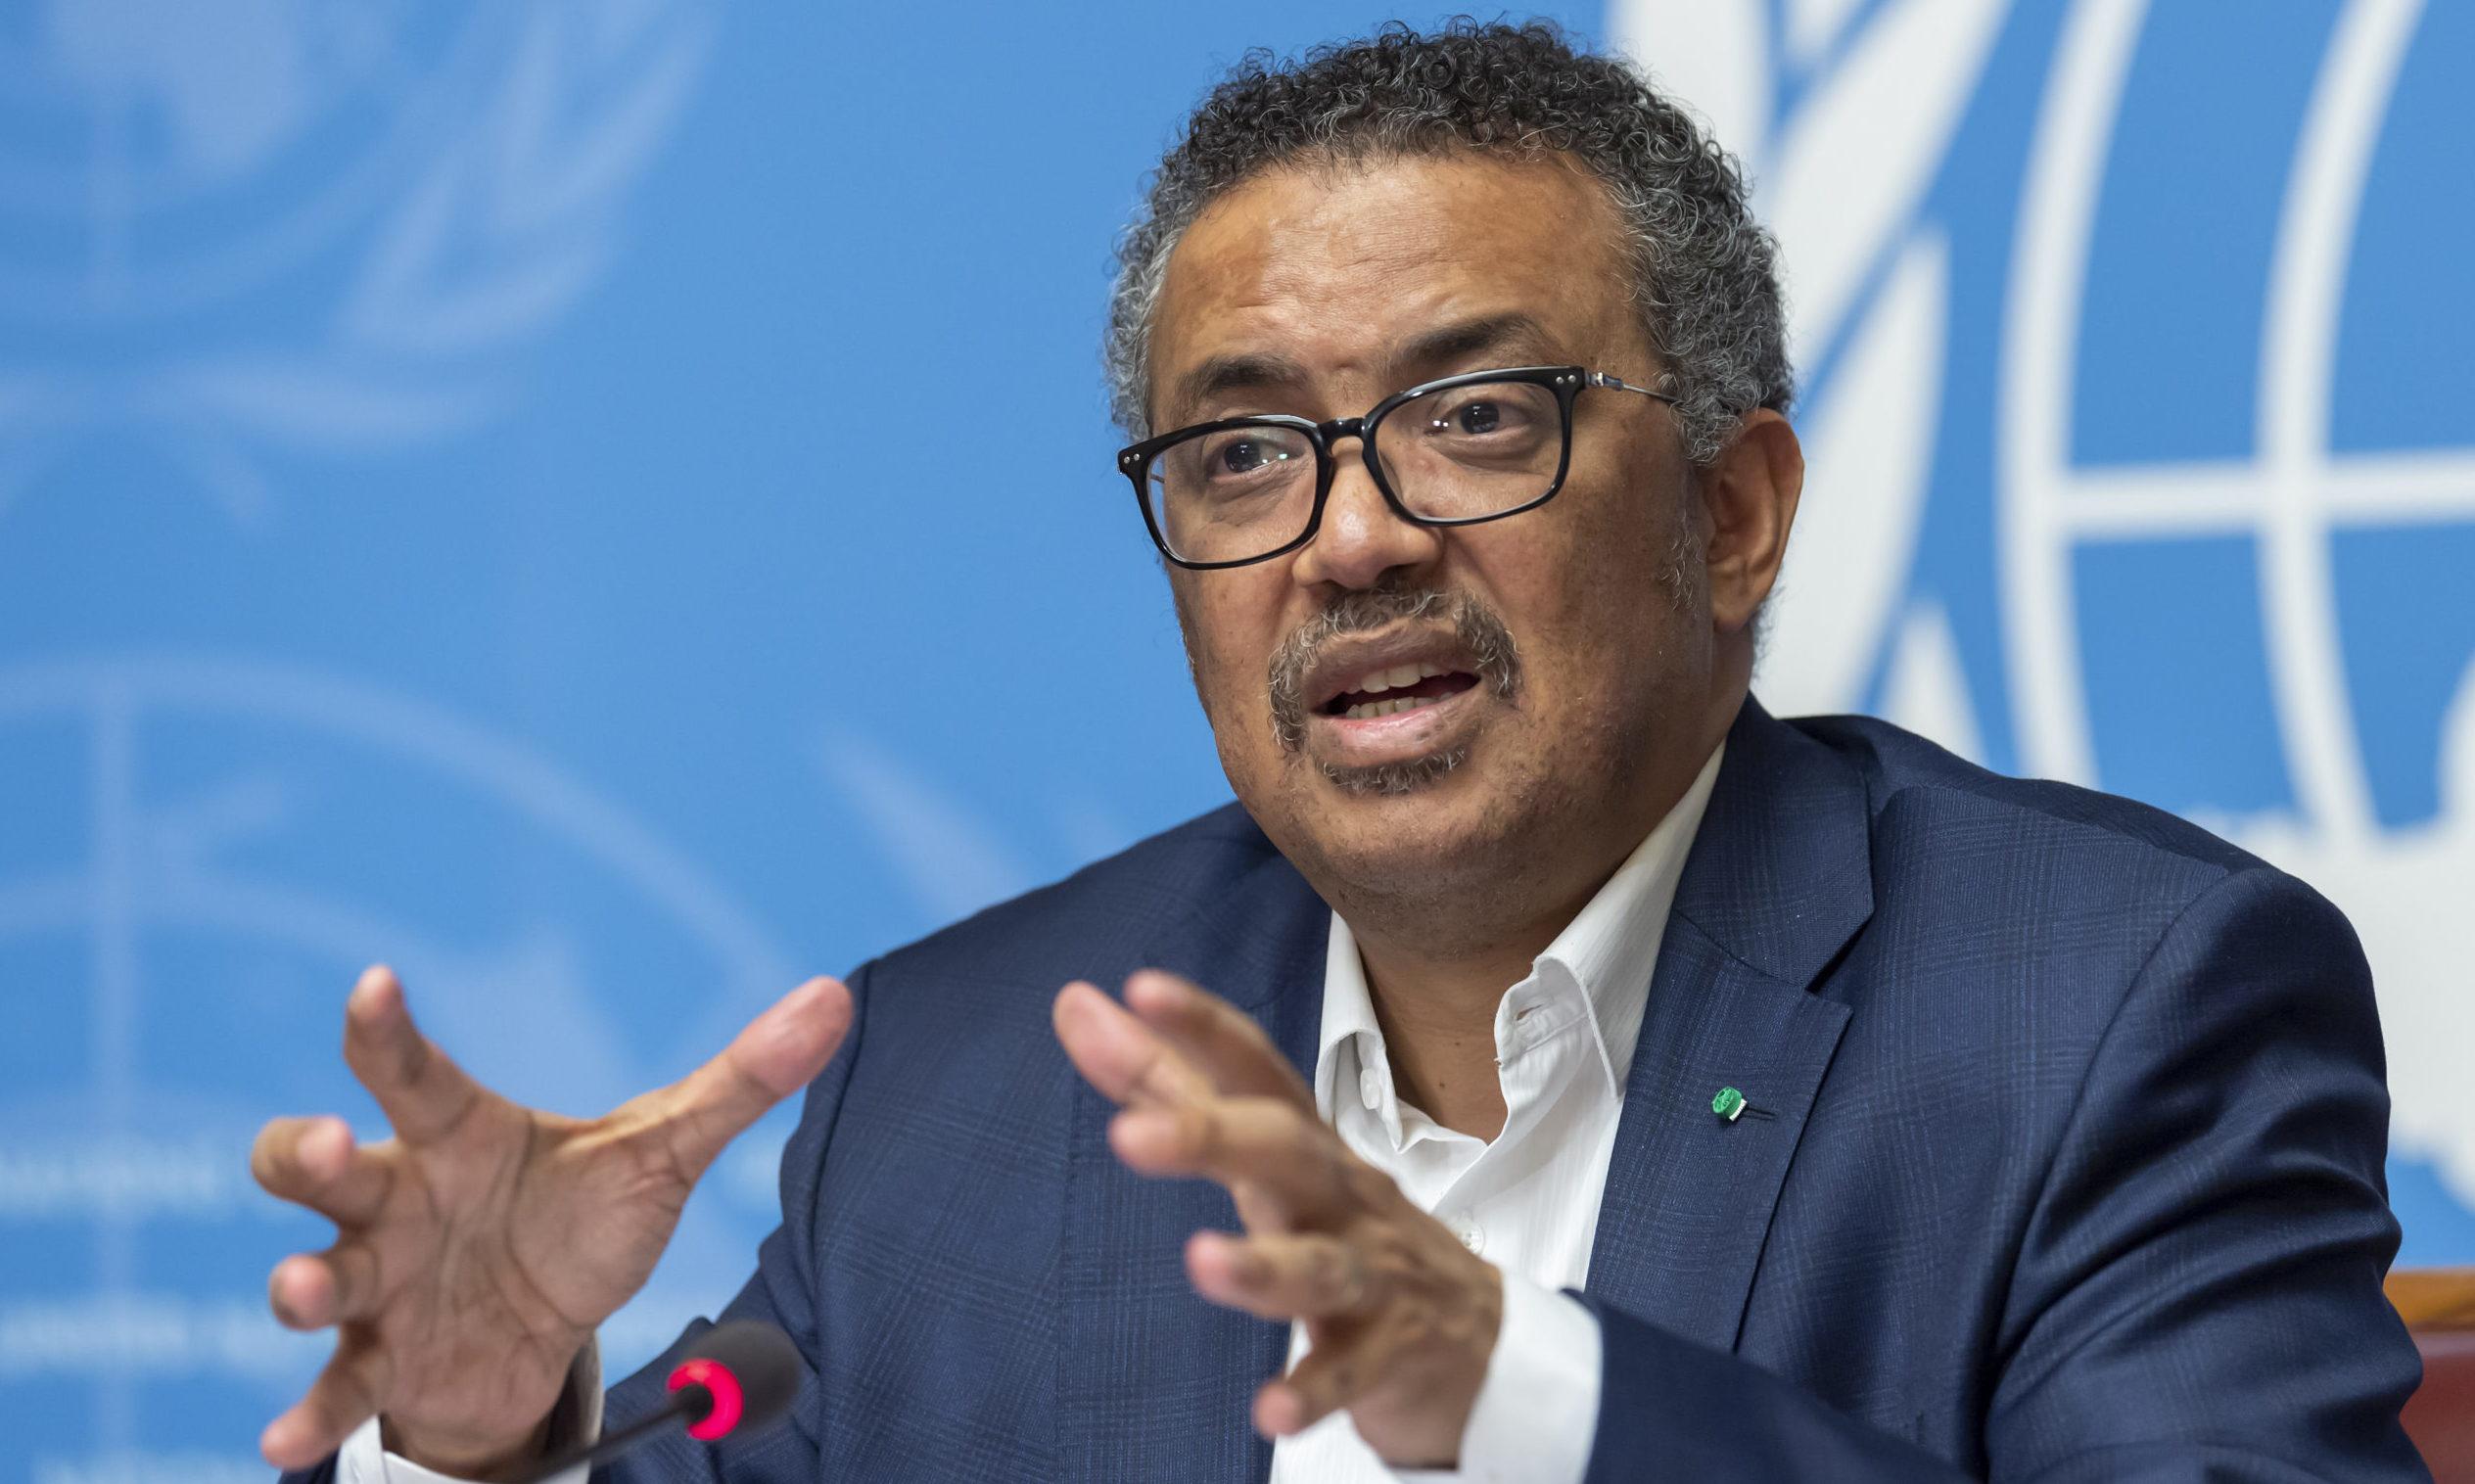 Tedros Adhanom Ghebreyesus, Director-General of the World Health Organisation (WHO).